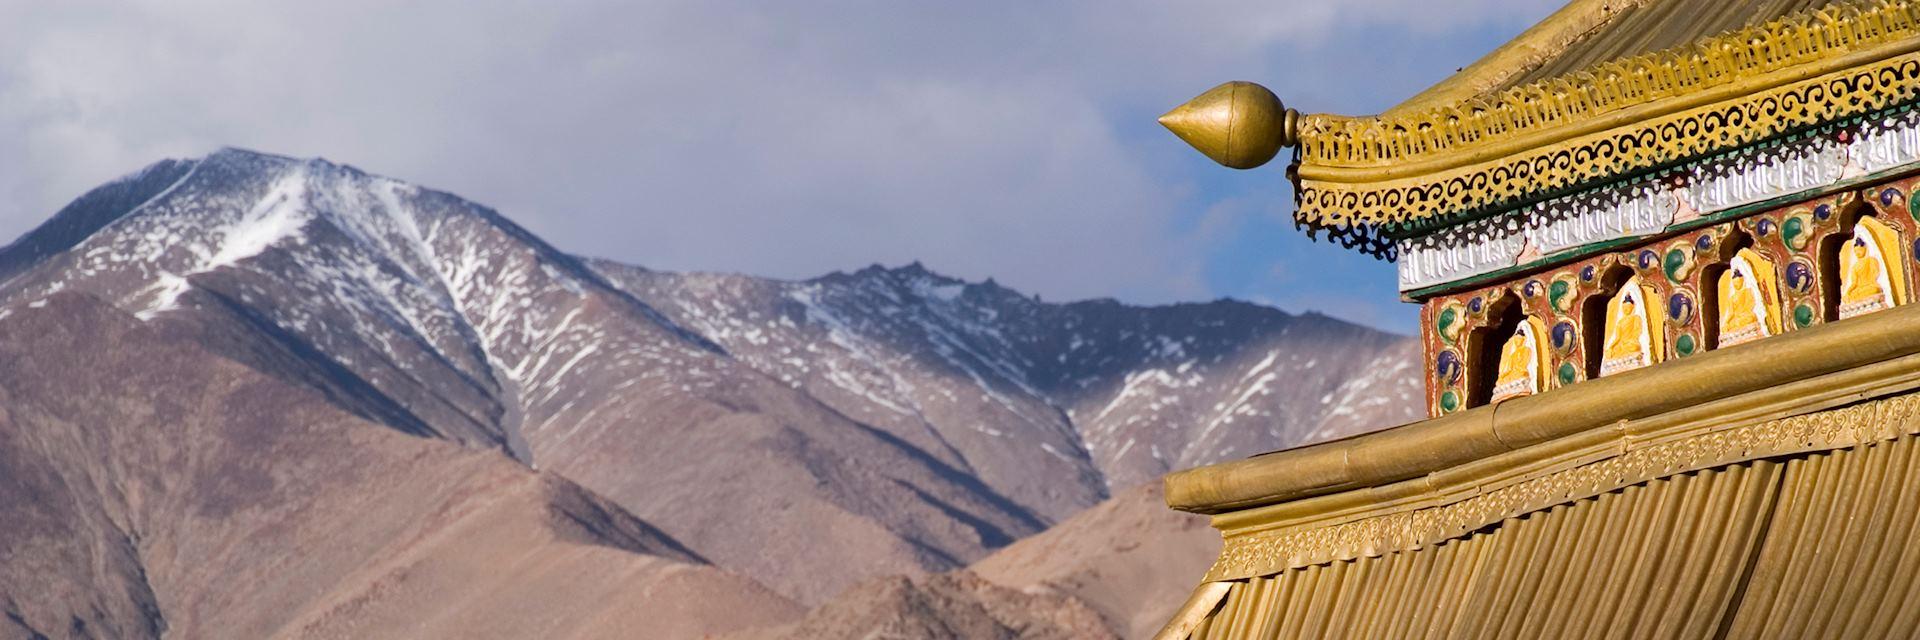 Monastery in Leh, Ladakh, northern India